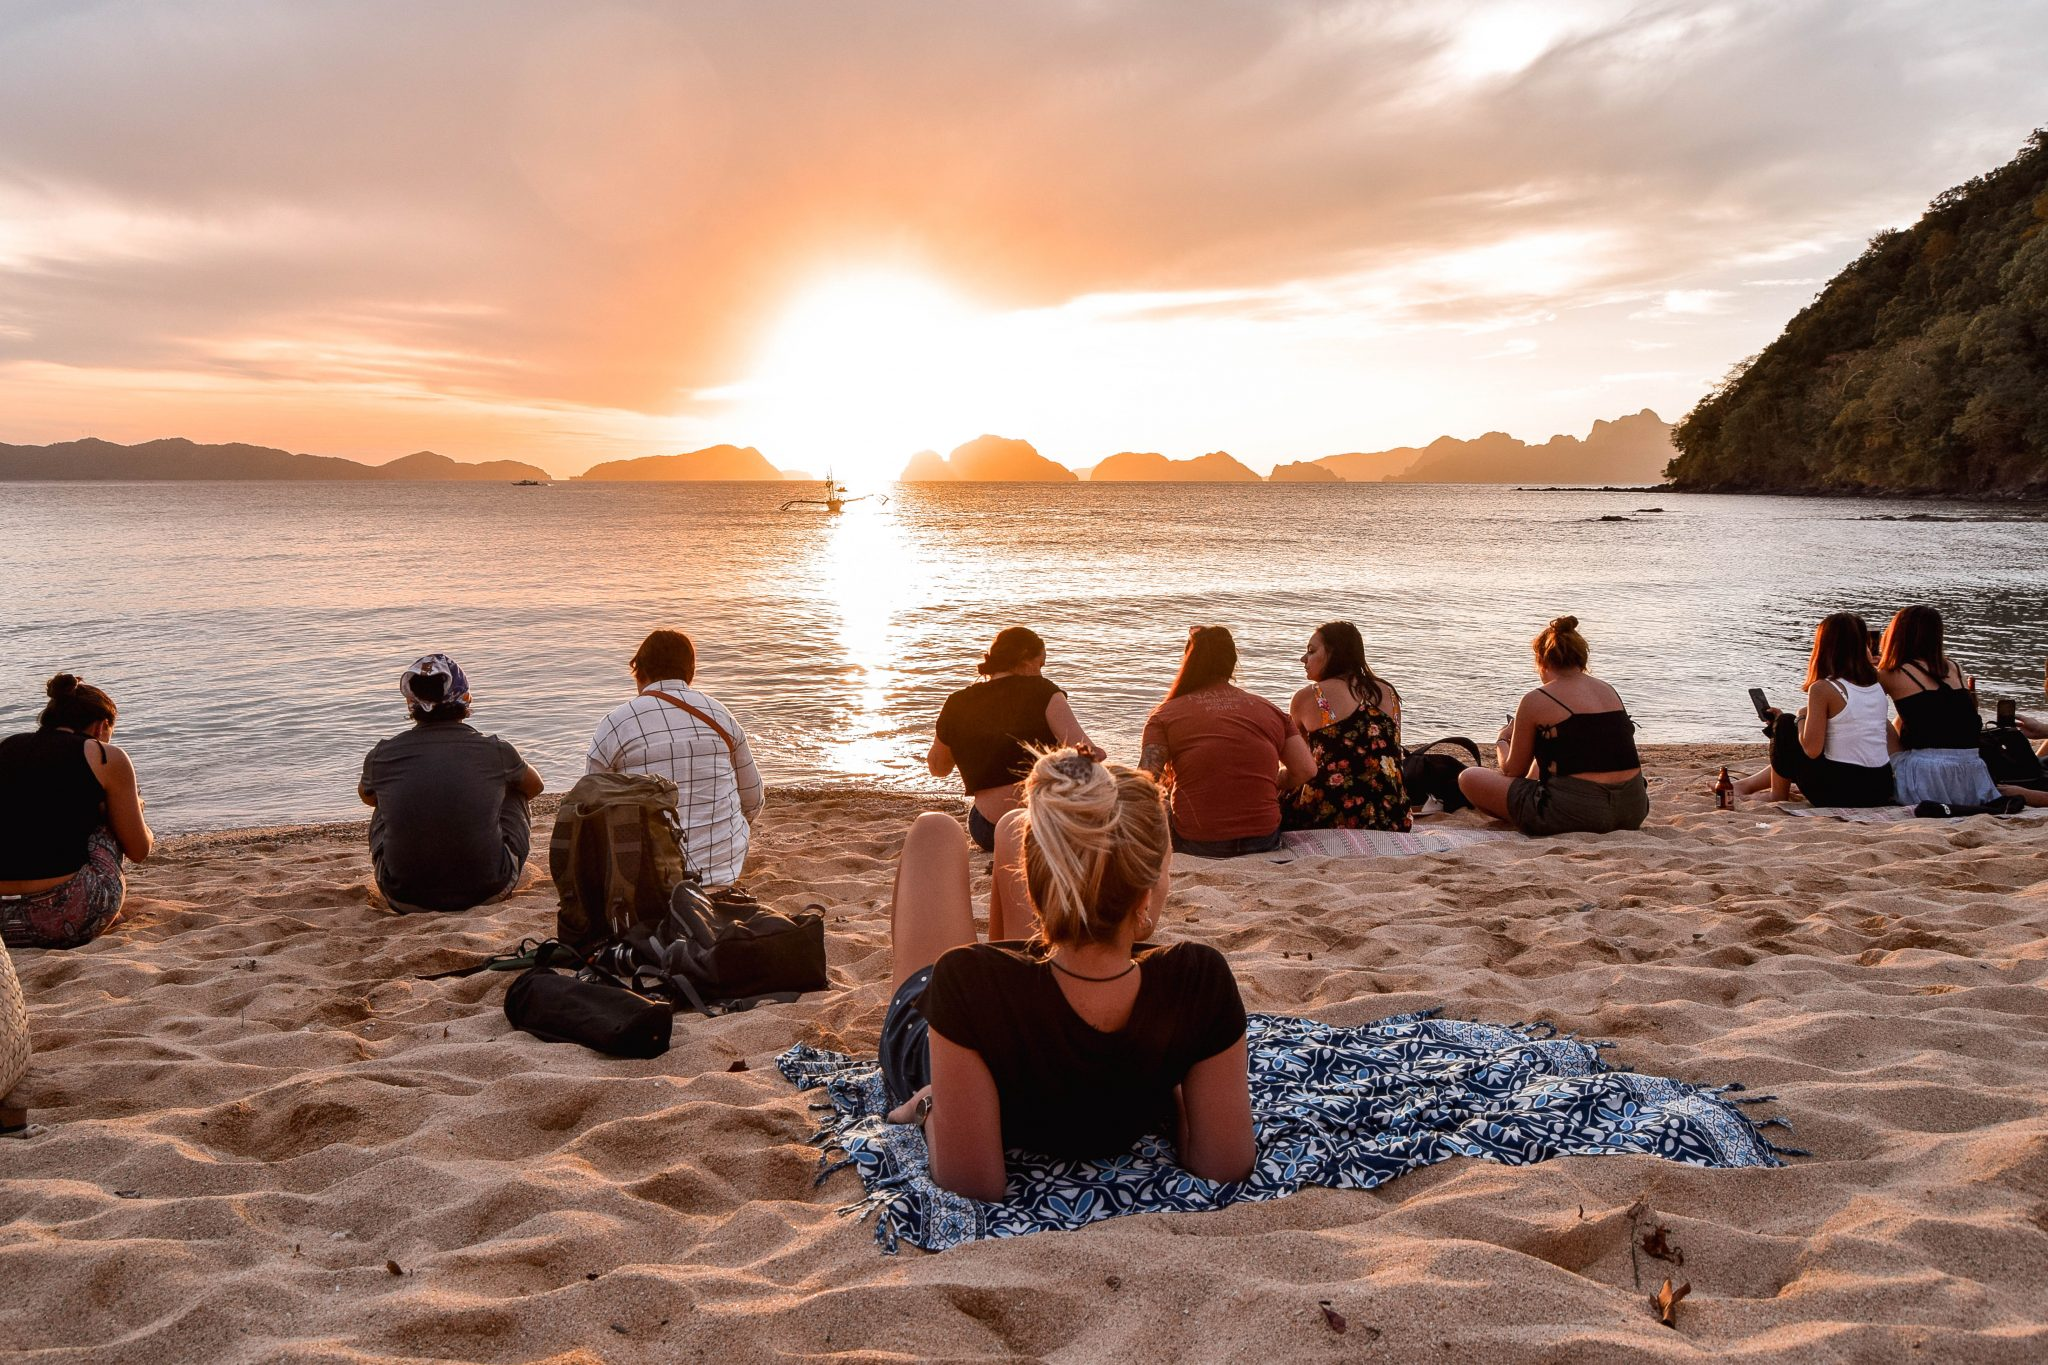 10 El Nido Beaches for Your Next Motorbike Adventure